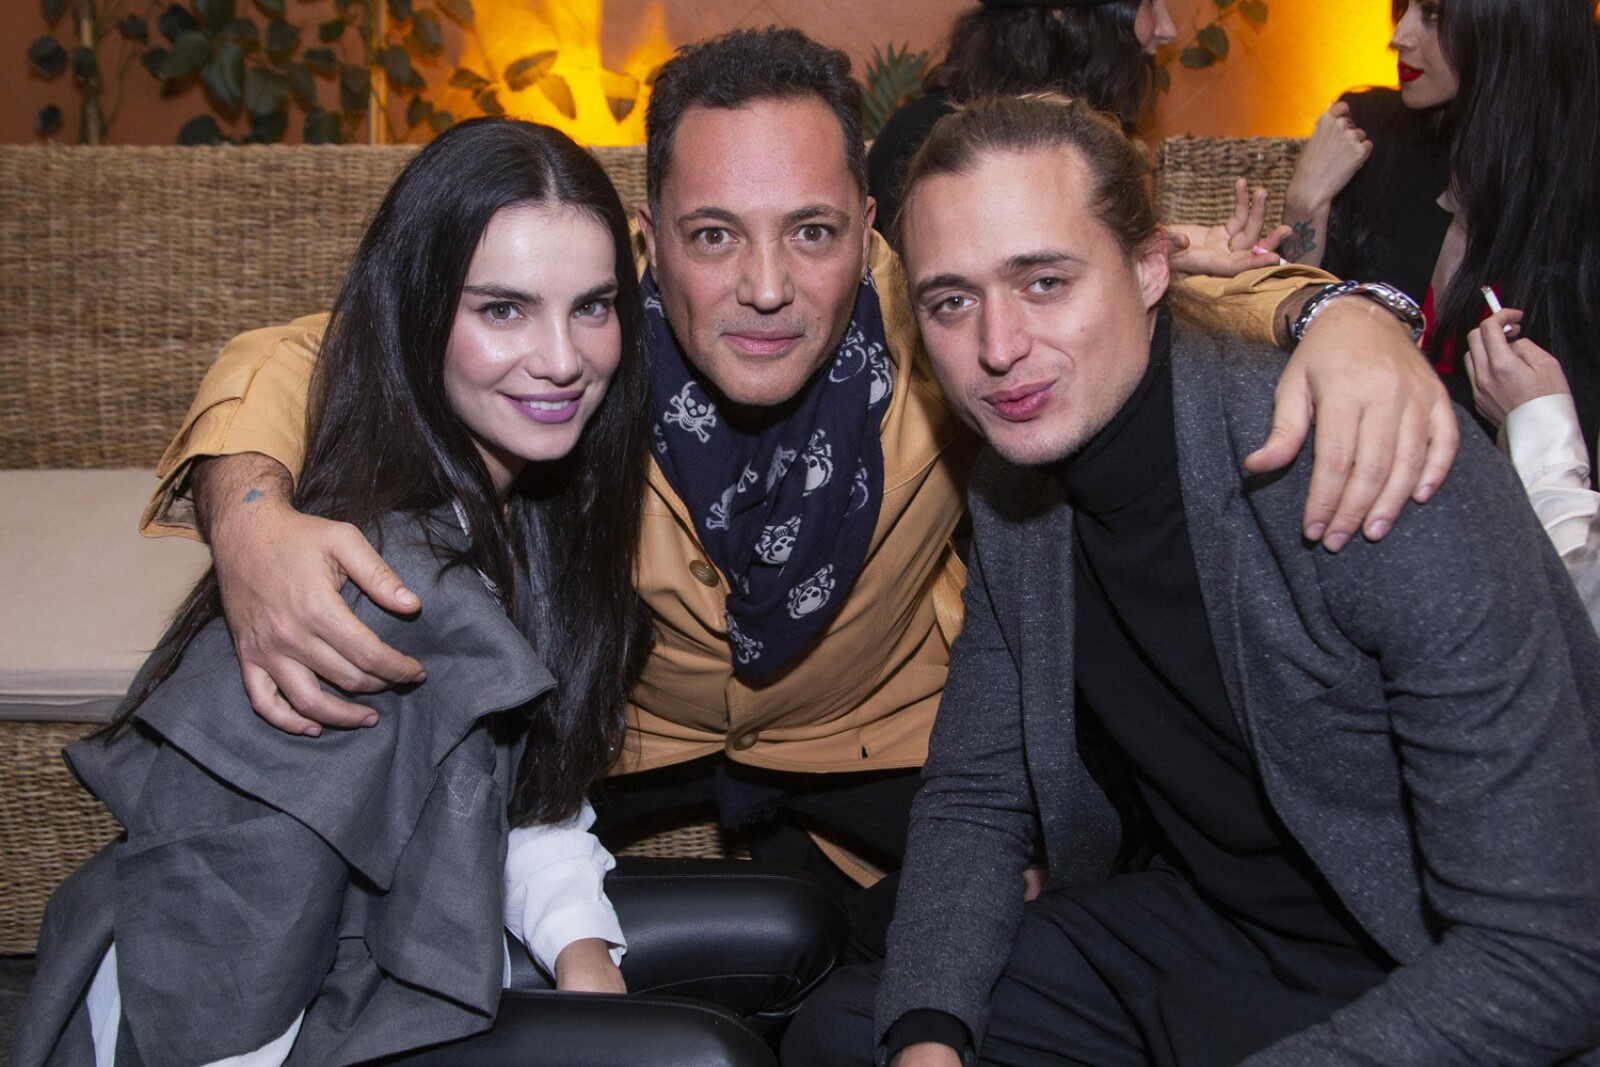 Ayari Anaya, Hector Bitar, Alexander Diaz